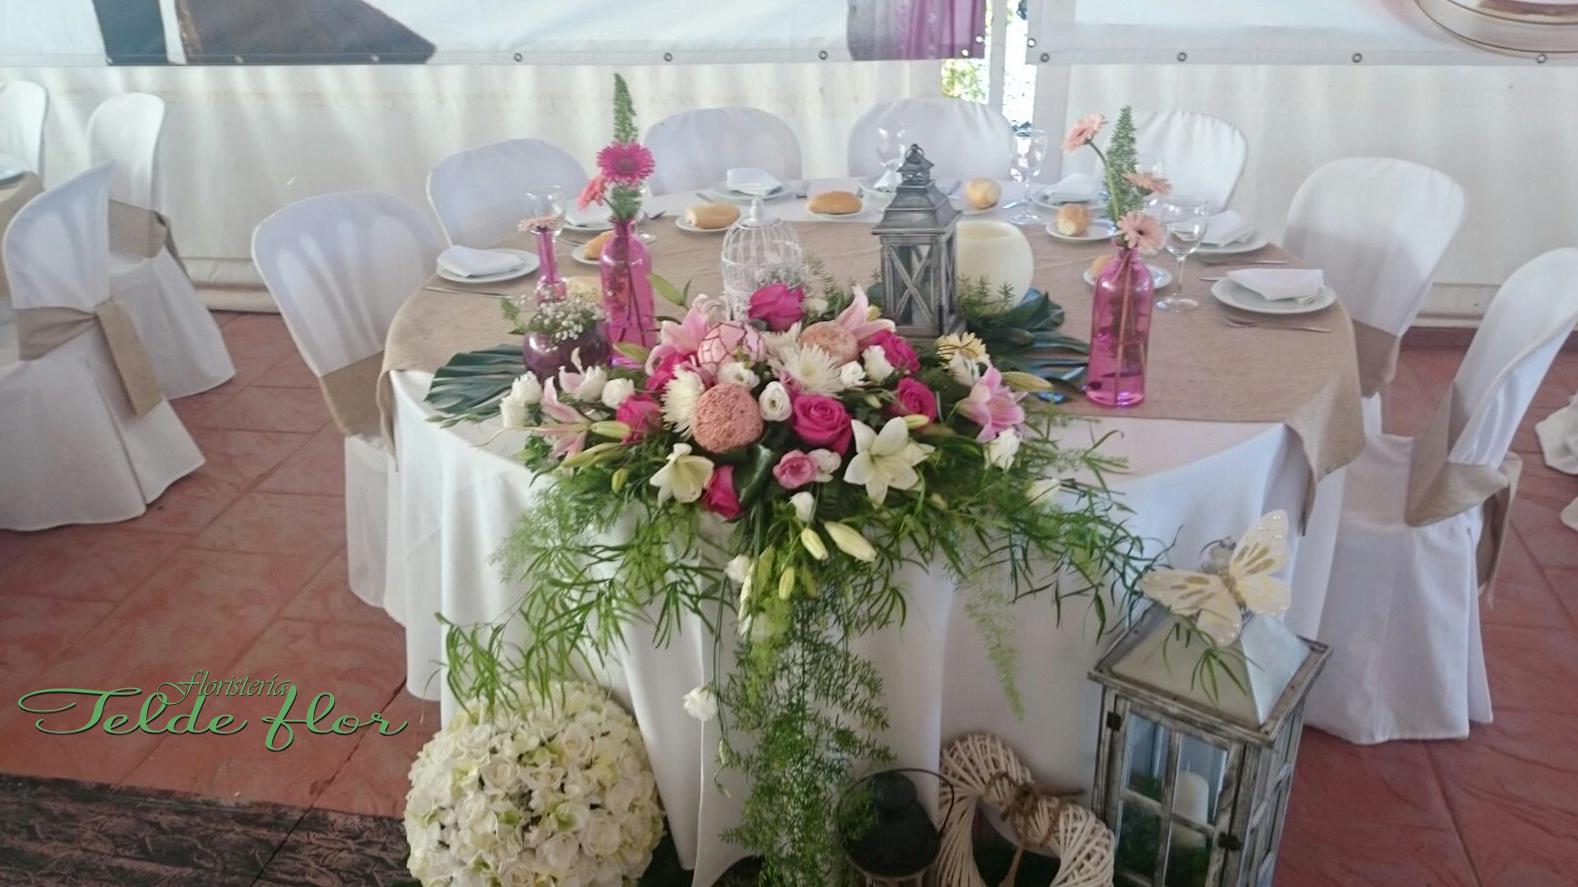 Servicio novia por correo coño en Telde